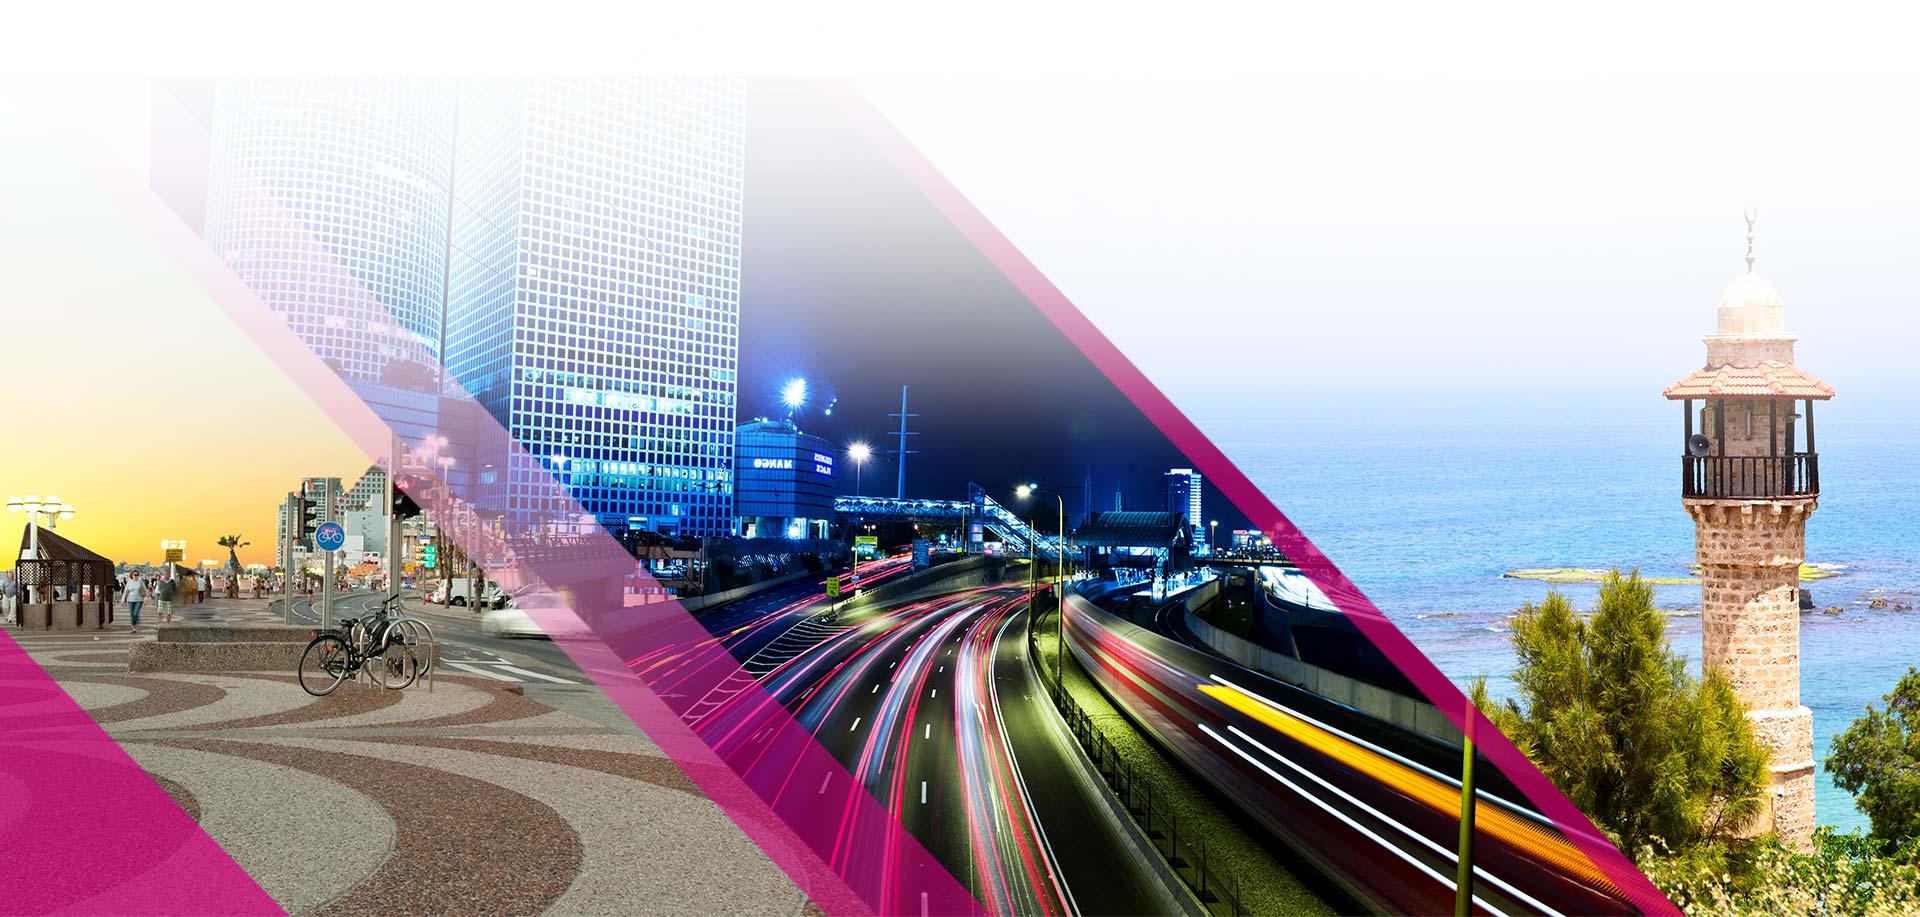 Tel Aviv, IOM 2020, biennial congress